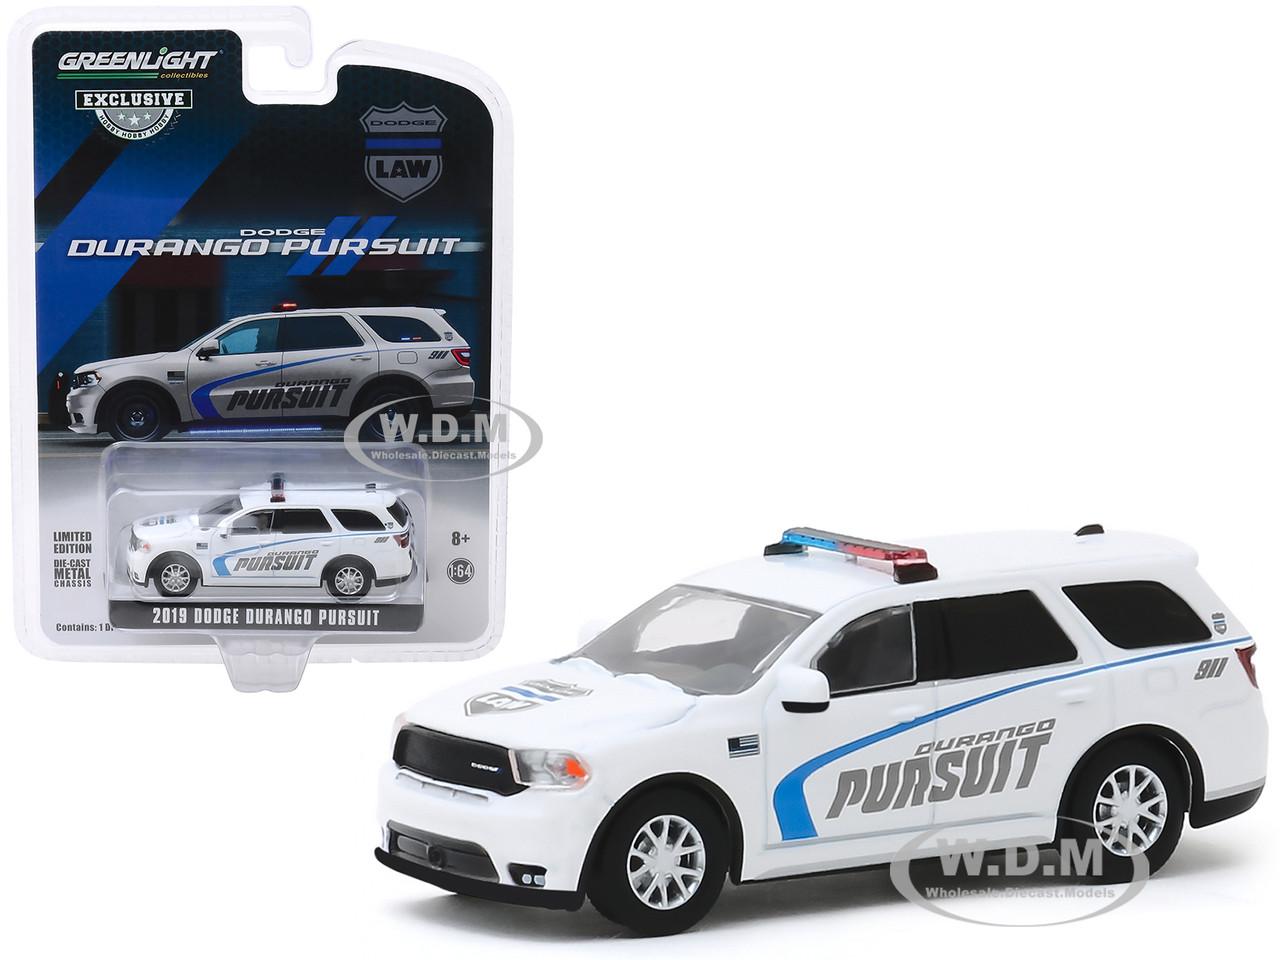 2019 Dodge Durango Pursuit Police Suv White Hobby Exclusive 1 64 Diecast Model Car Greenlight 30119